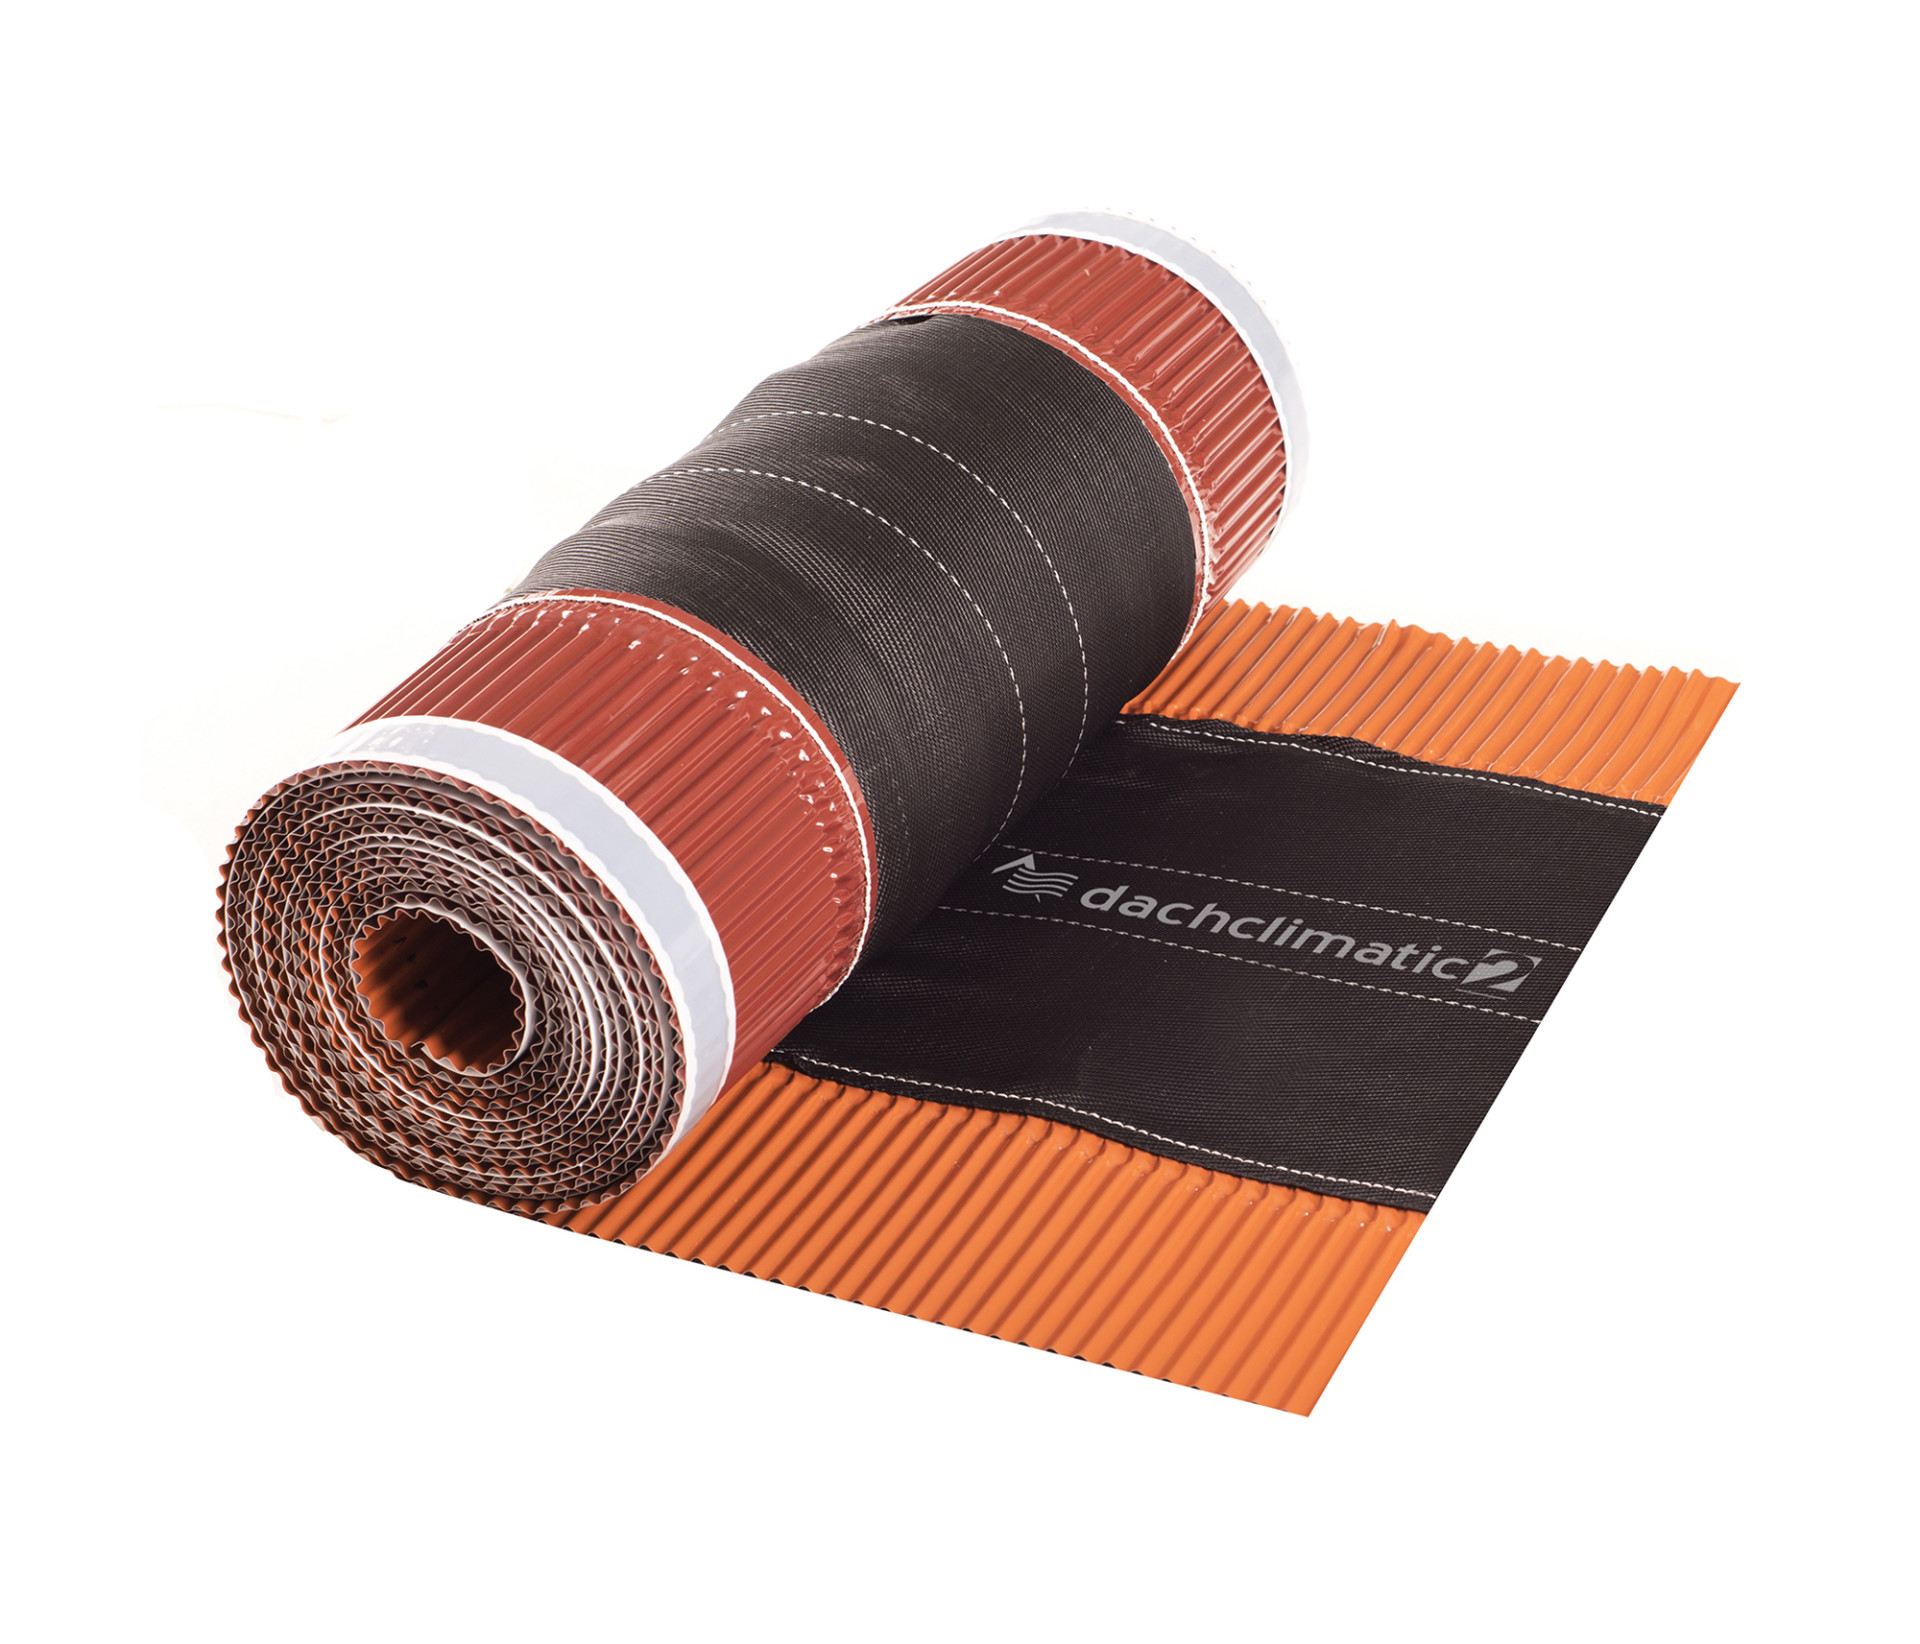 constrain trompe mat outfitters loeil zoom urban qlt floor hei mats oeil tape slide shop view redesign fit l f